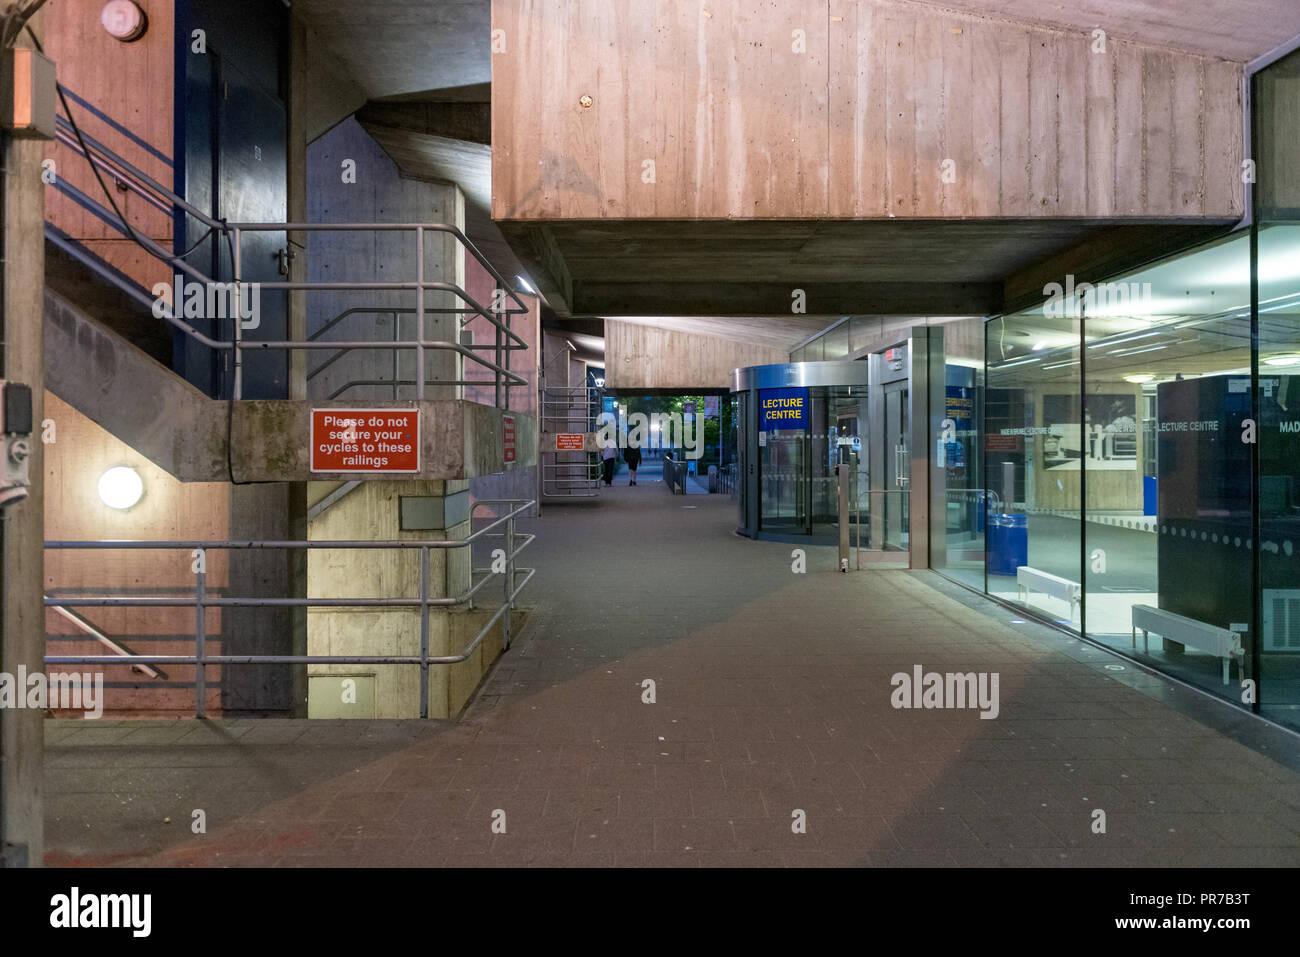 Brunel University London, Uxbridge - Stock Image